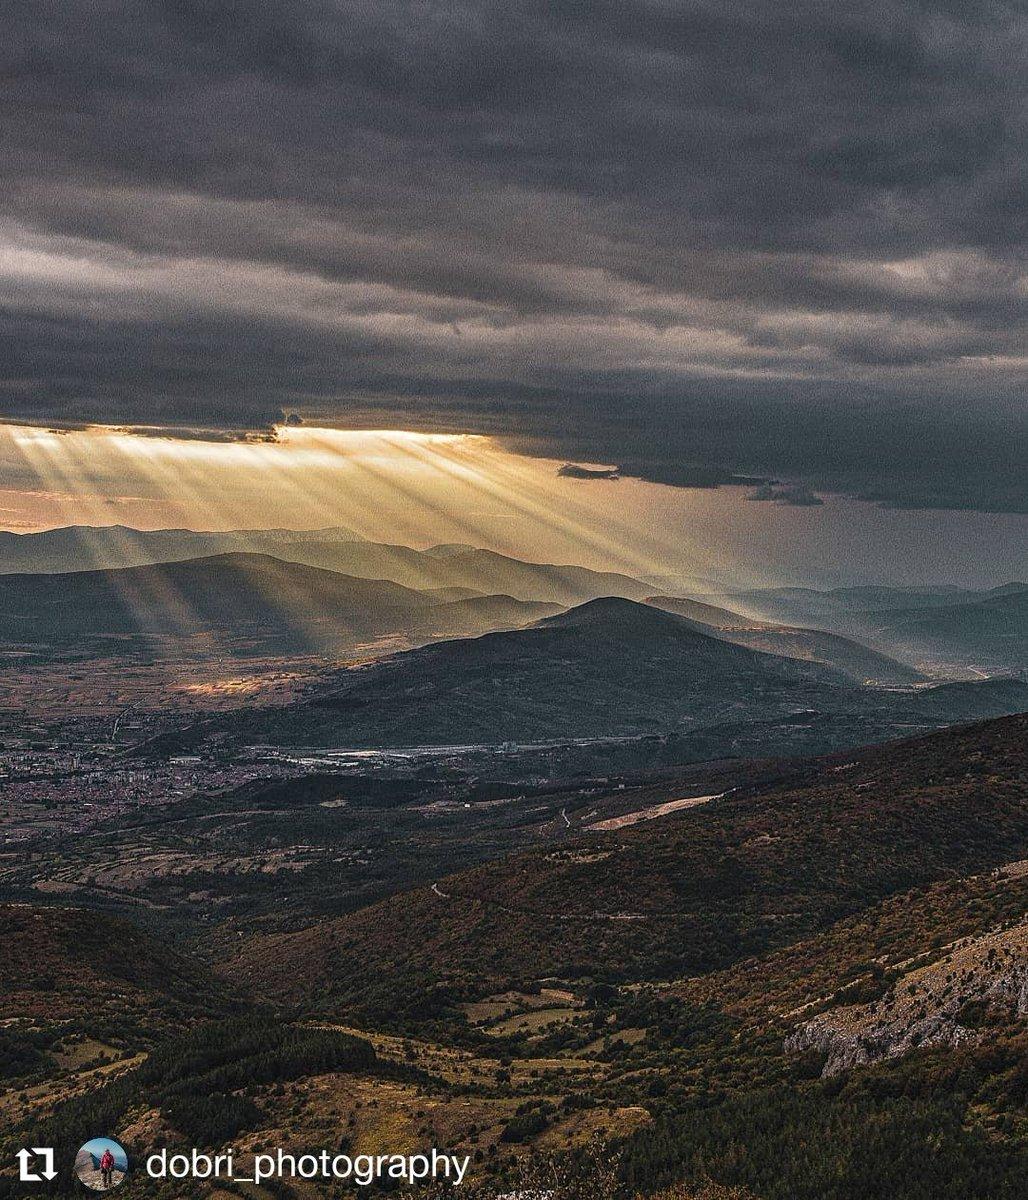 Kada Pirot priča priču, to izgleda ovako! #oblaci  . #wheretoserbia #pirot #niš #prirodasrbije #priroda #picoftheday #lifestory #natureadventure #natureview #mountain_world #exploreeverywhere on https://t.co/gubaEBlvR7 https://t.co/Xy6BLxUCiO